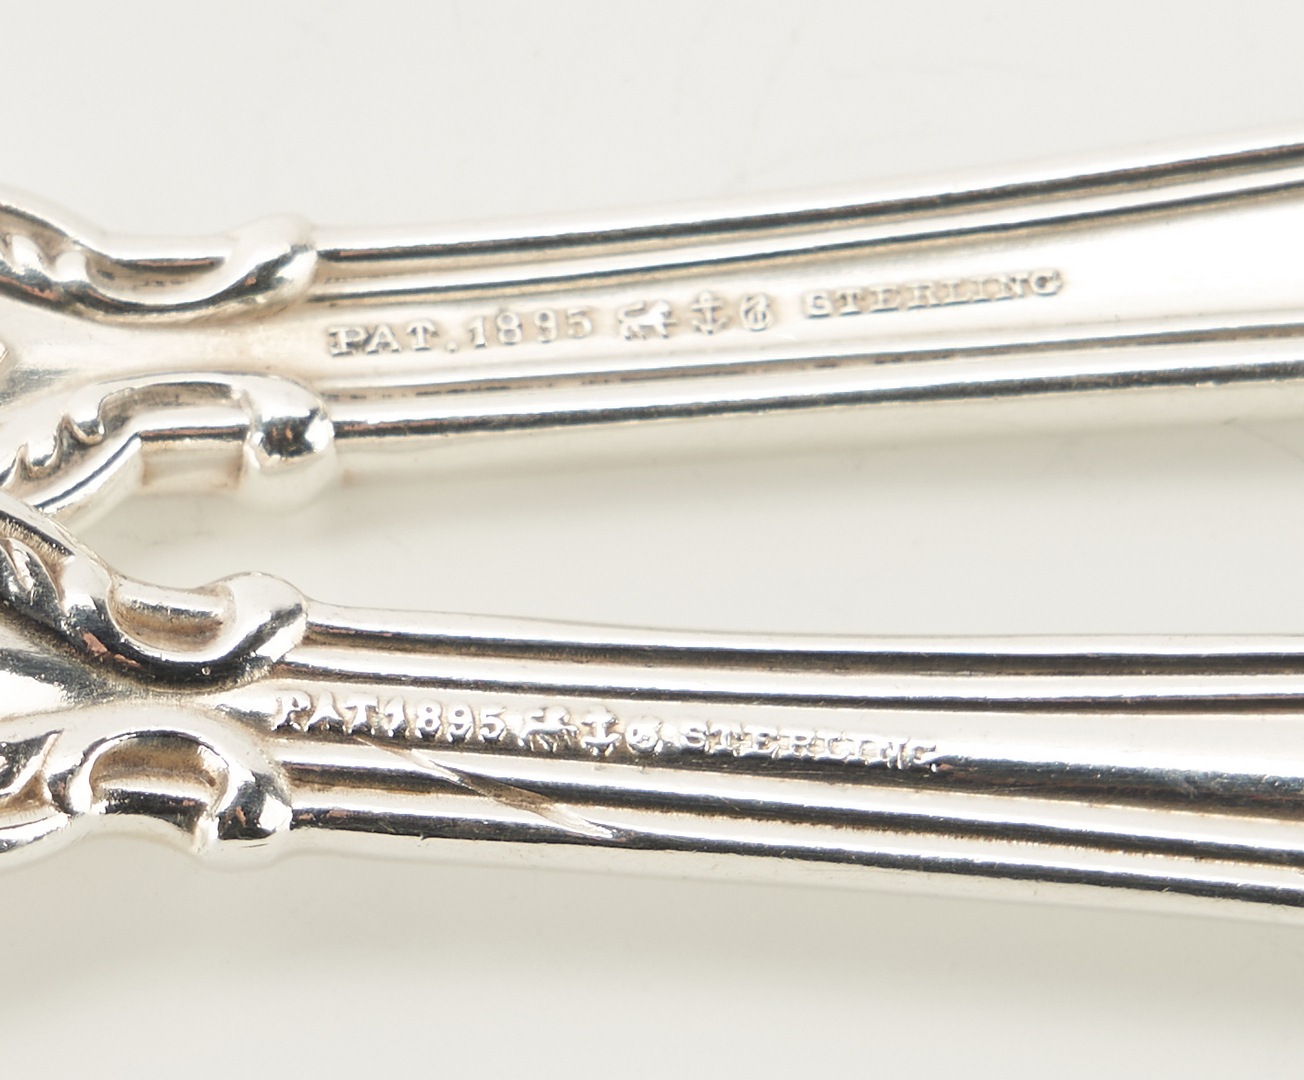 Lot 73: 154 Pcs. Gorham Chantilly Pattern Sterling Silver Flatware